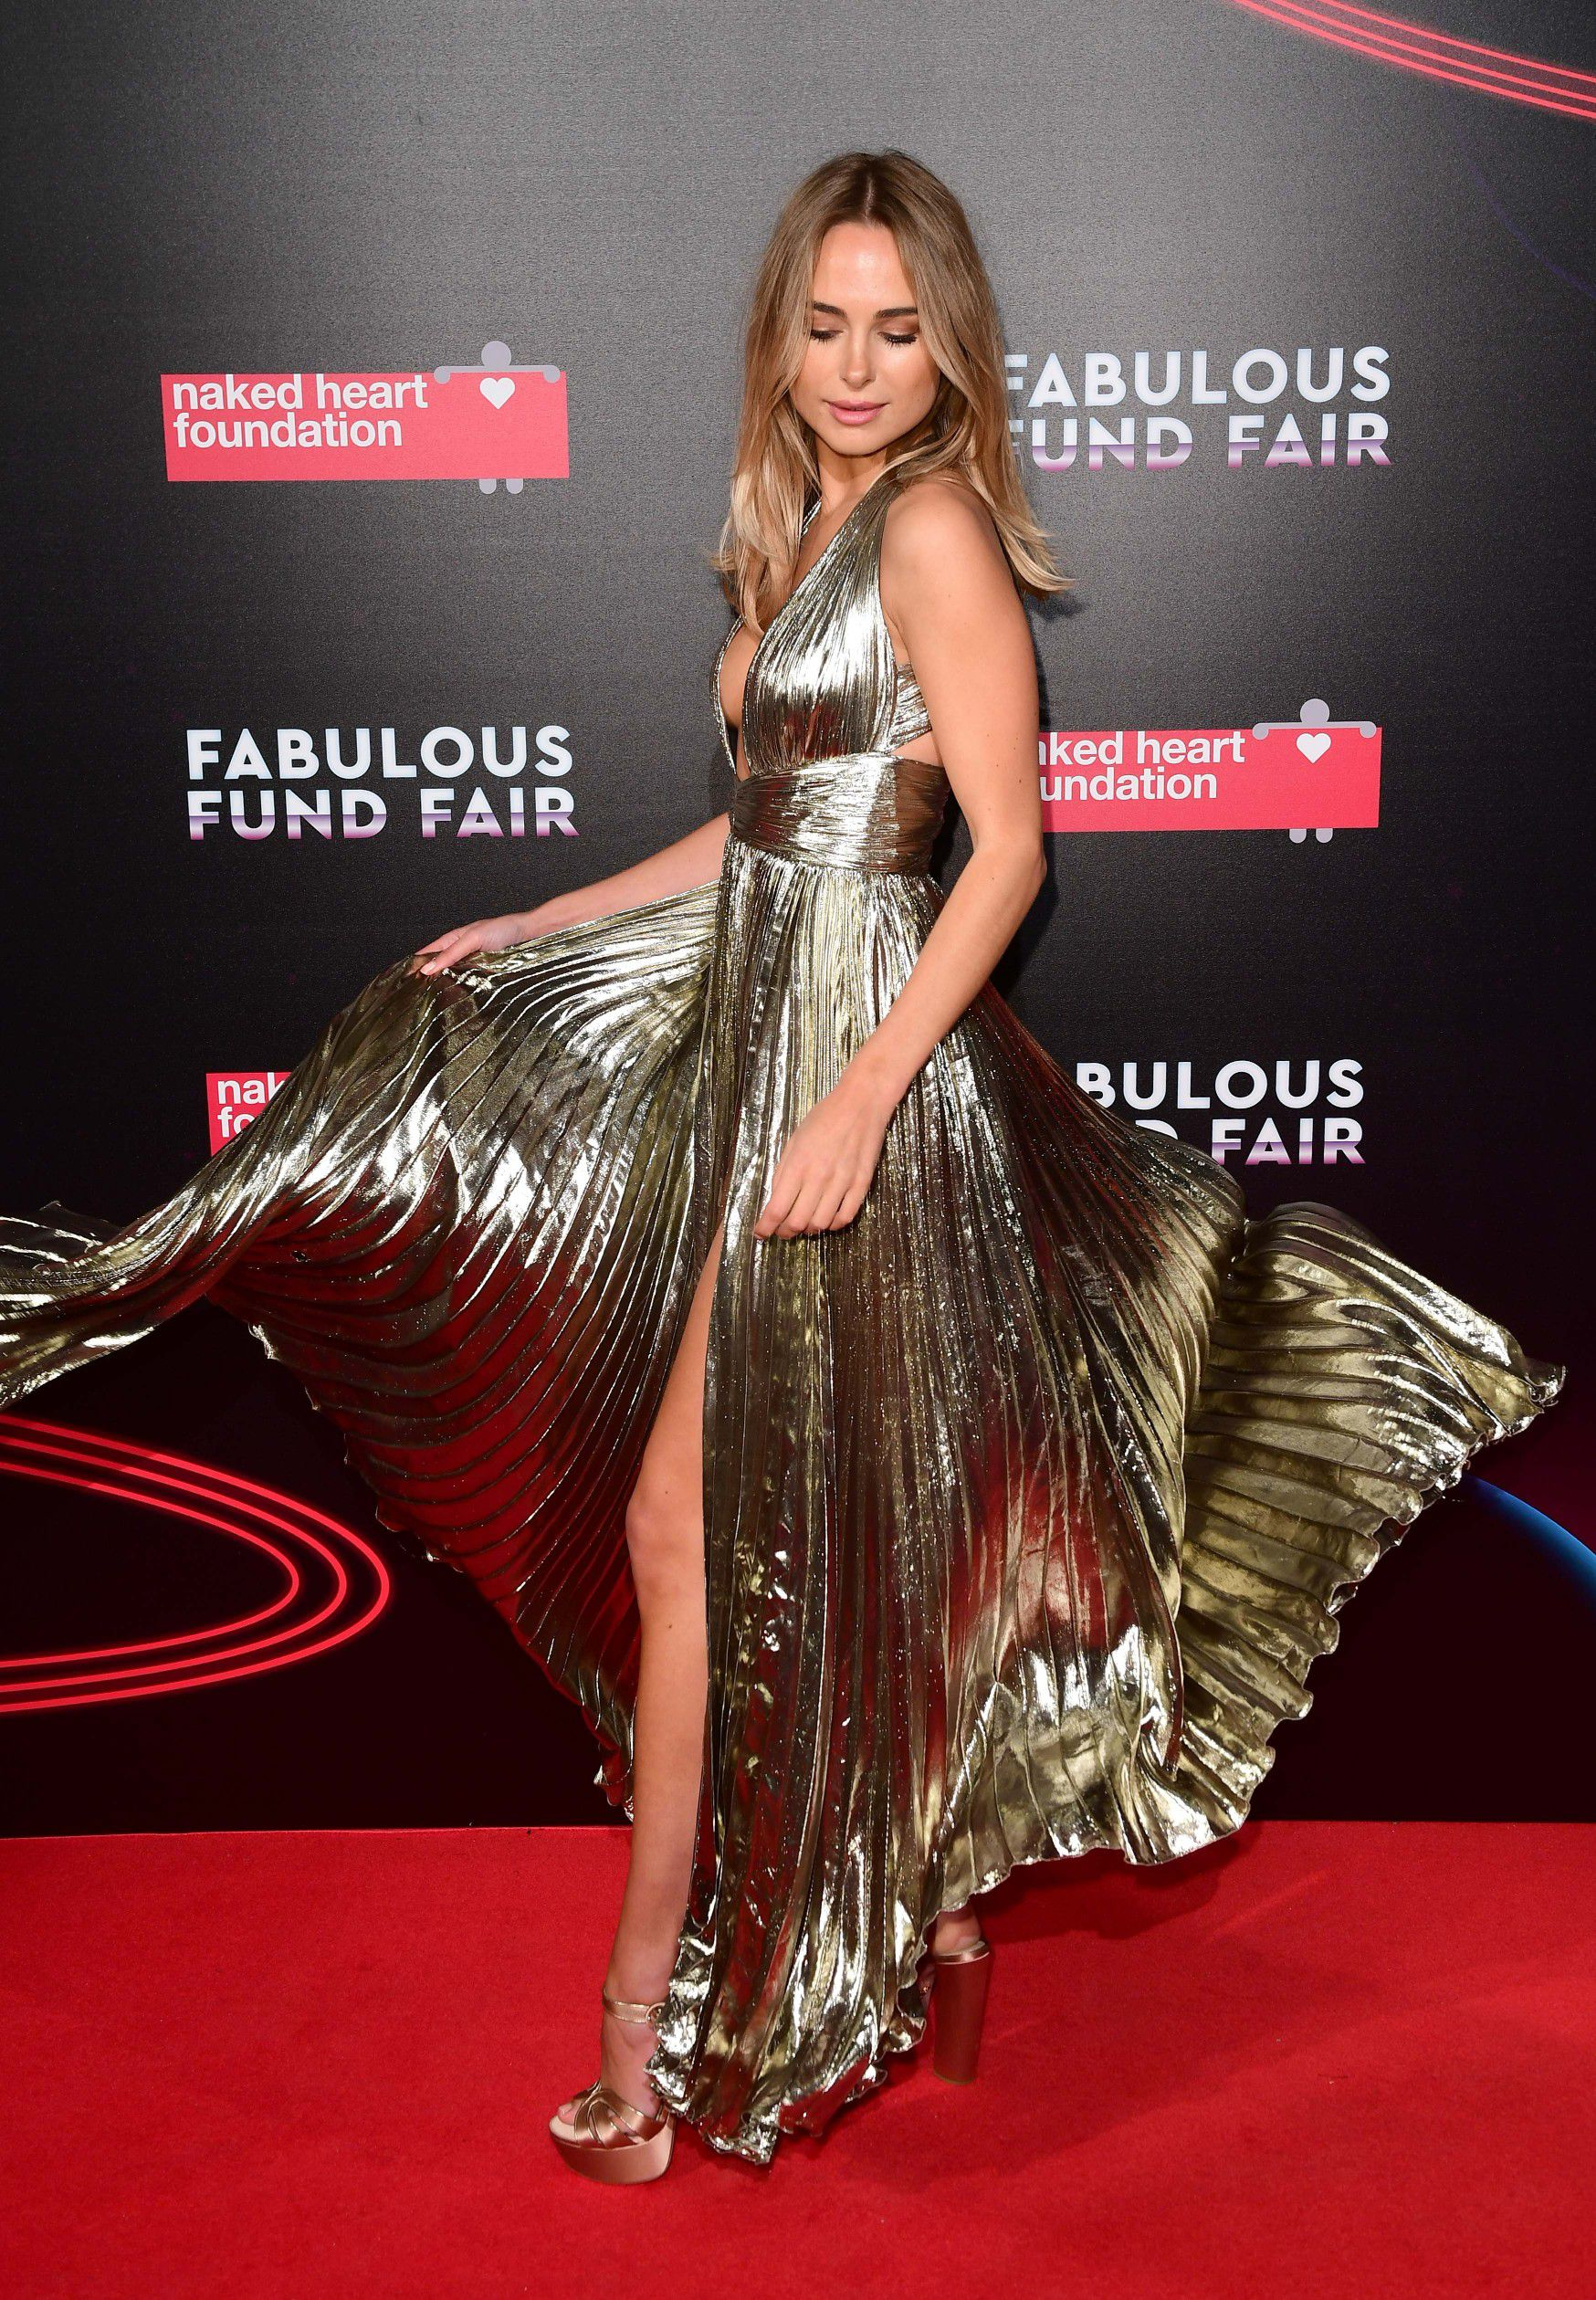 kimberley-garner-cleavage-at-fabulous-fund-fair-in-london-6810